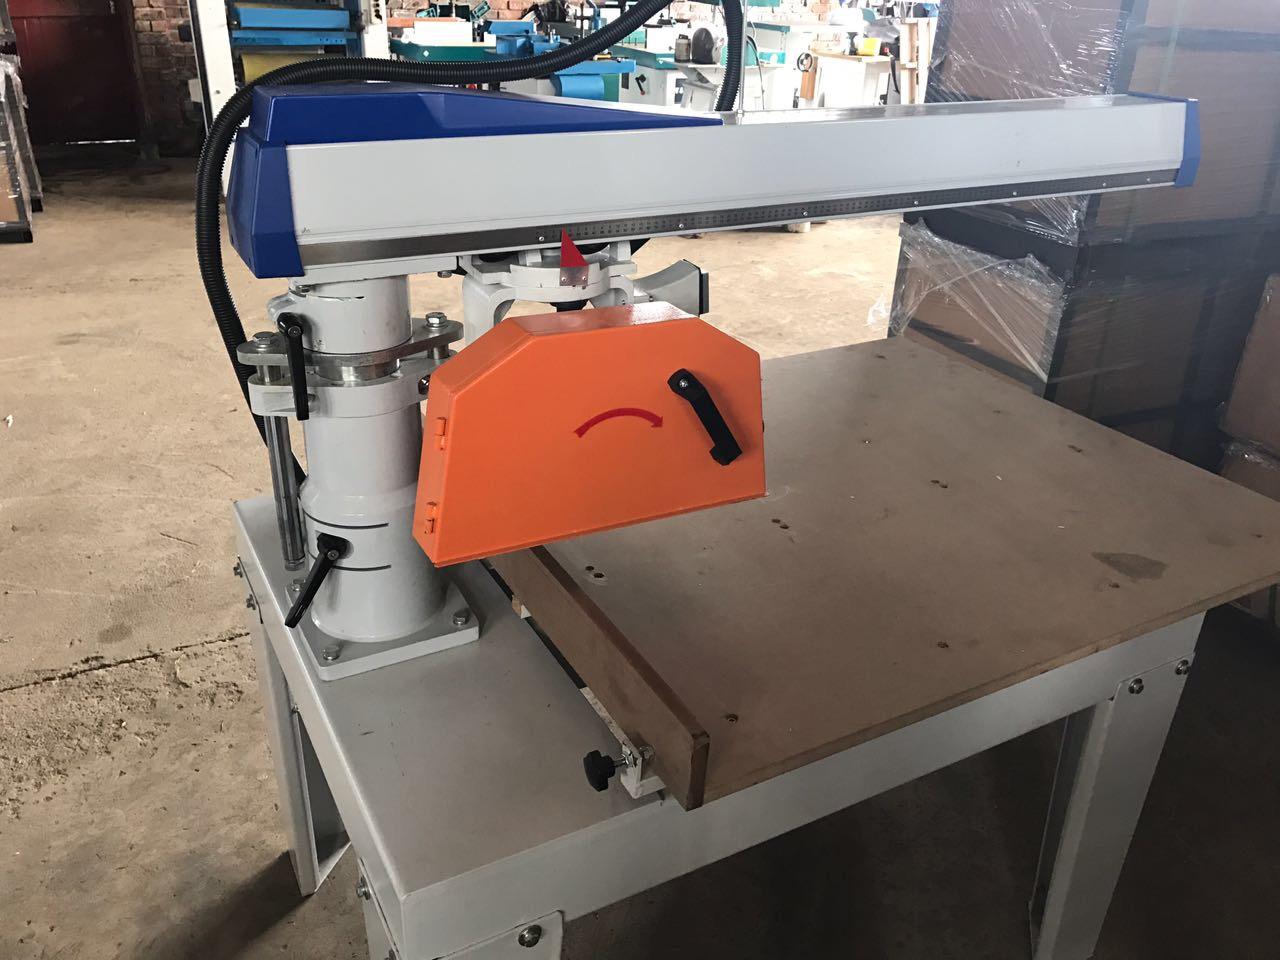 Radial Arm Saw, ROOSMAC, MJ930, 930x110mm, Ø-355mm, 3kW